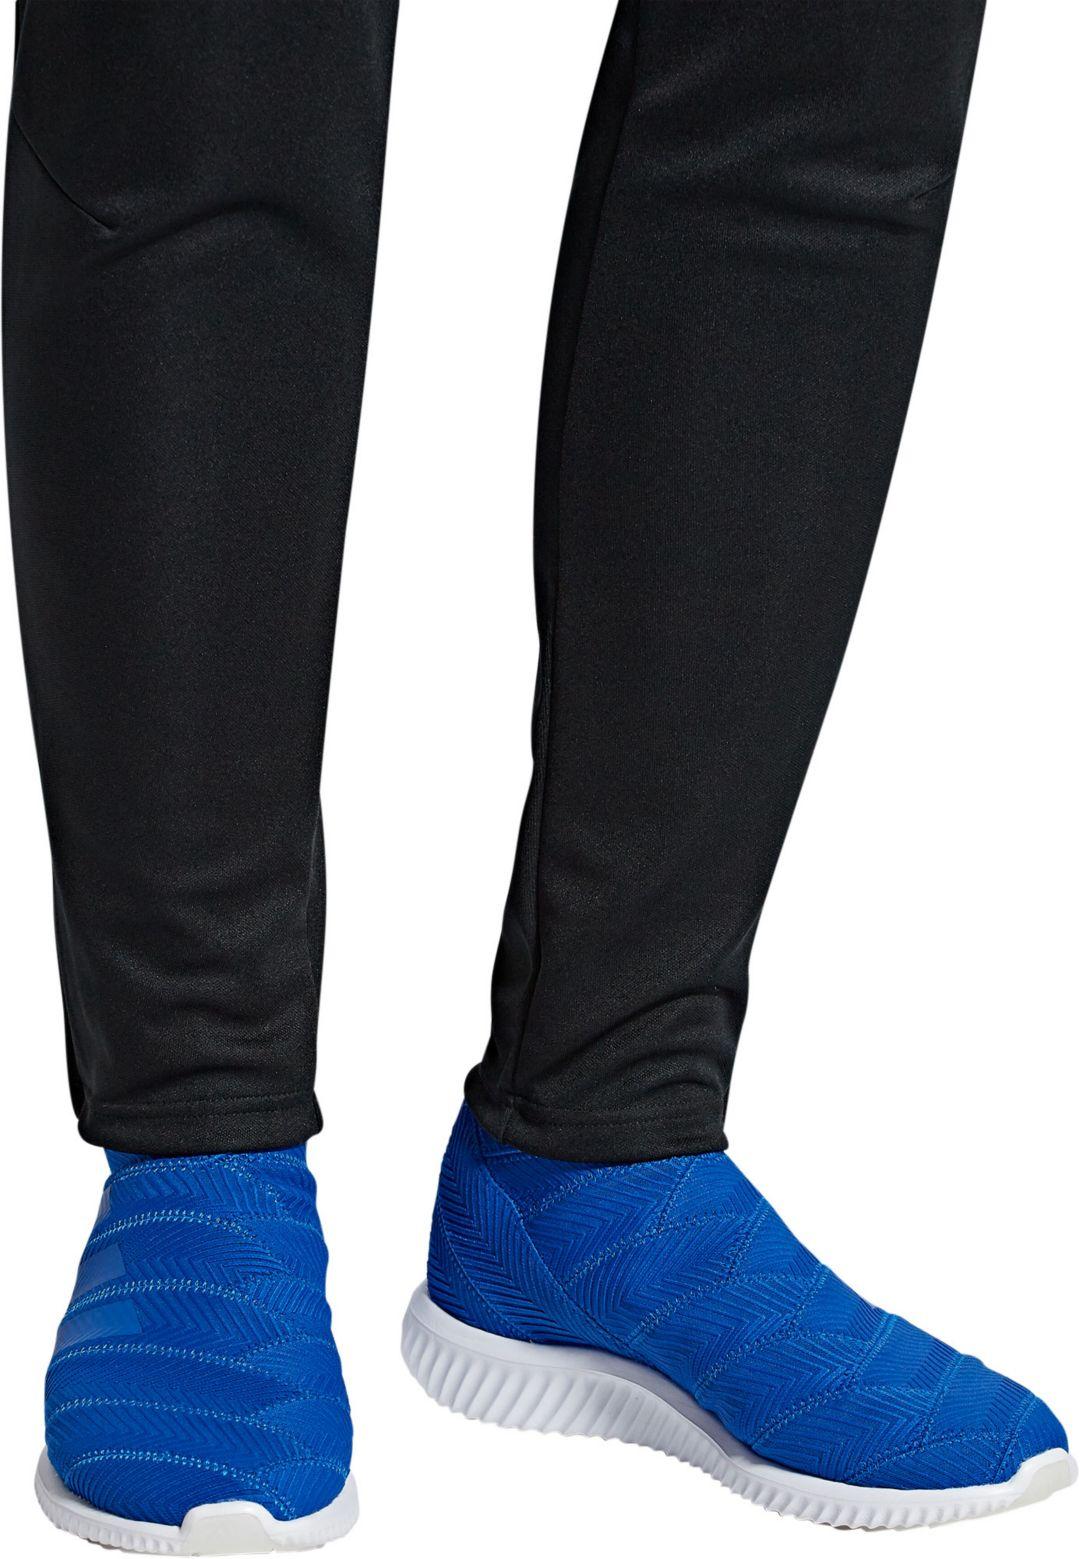 934b624153267 adidas Men's Nemeziz Tango 18.1 TR Soccer Trainer